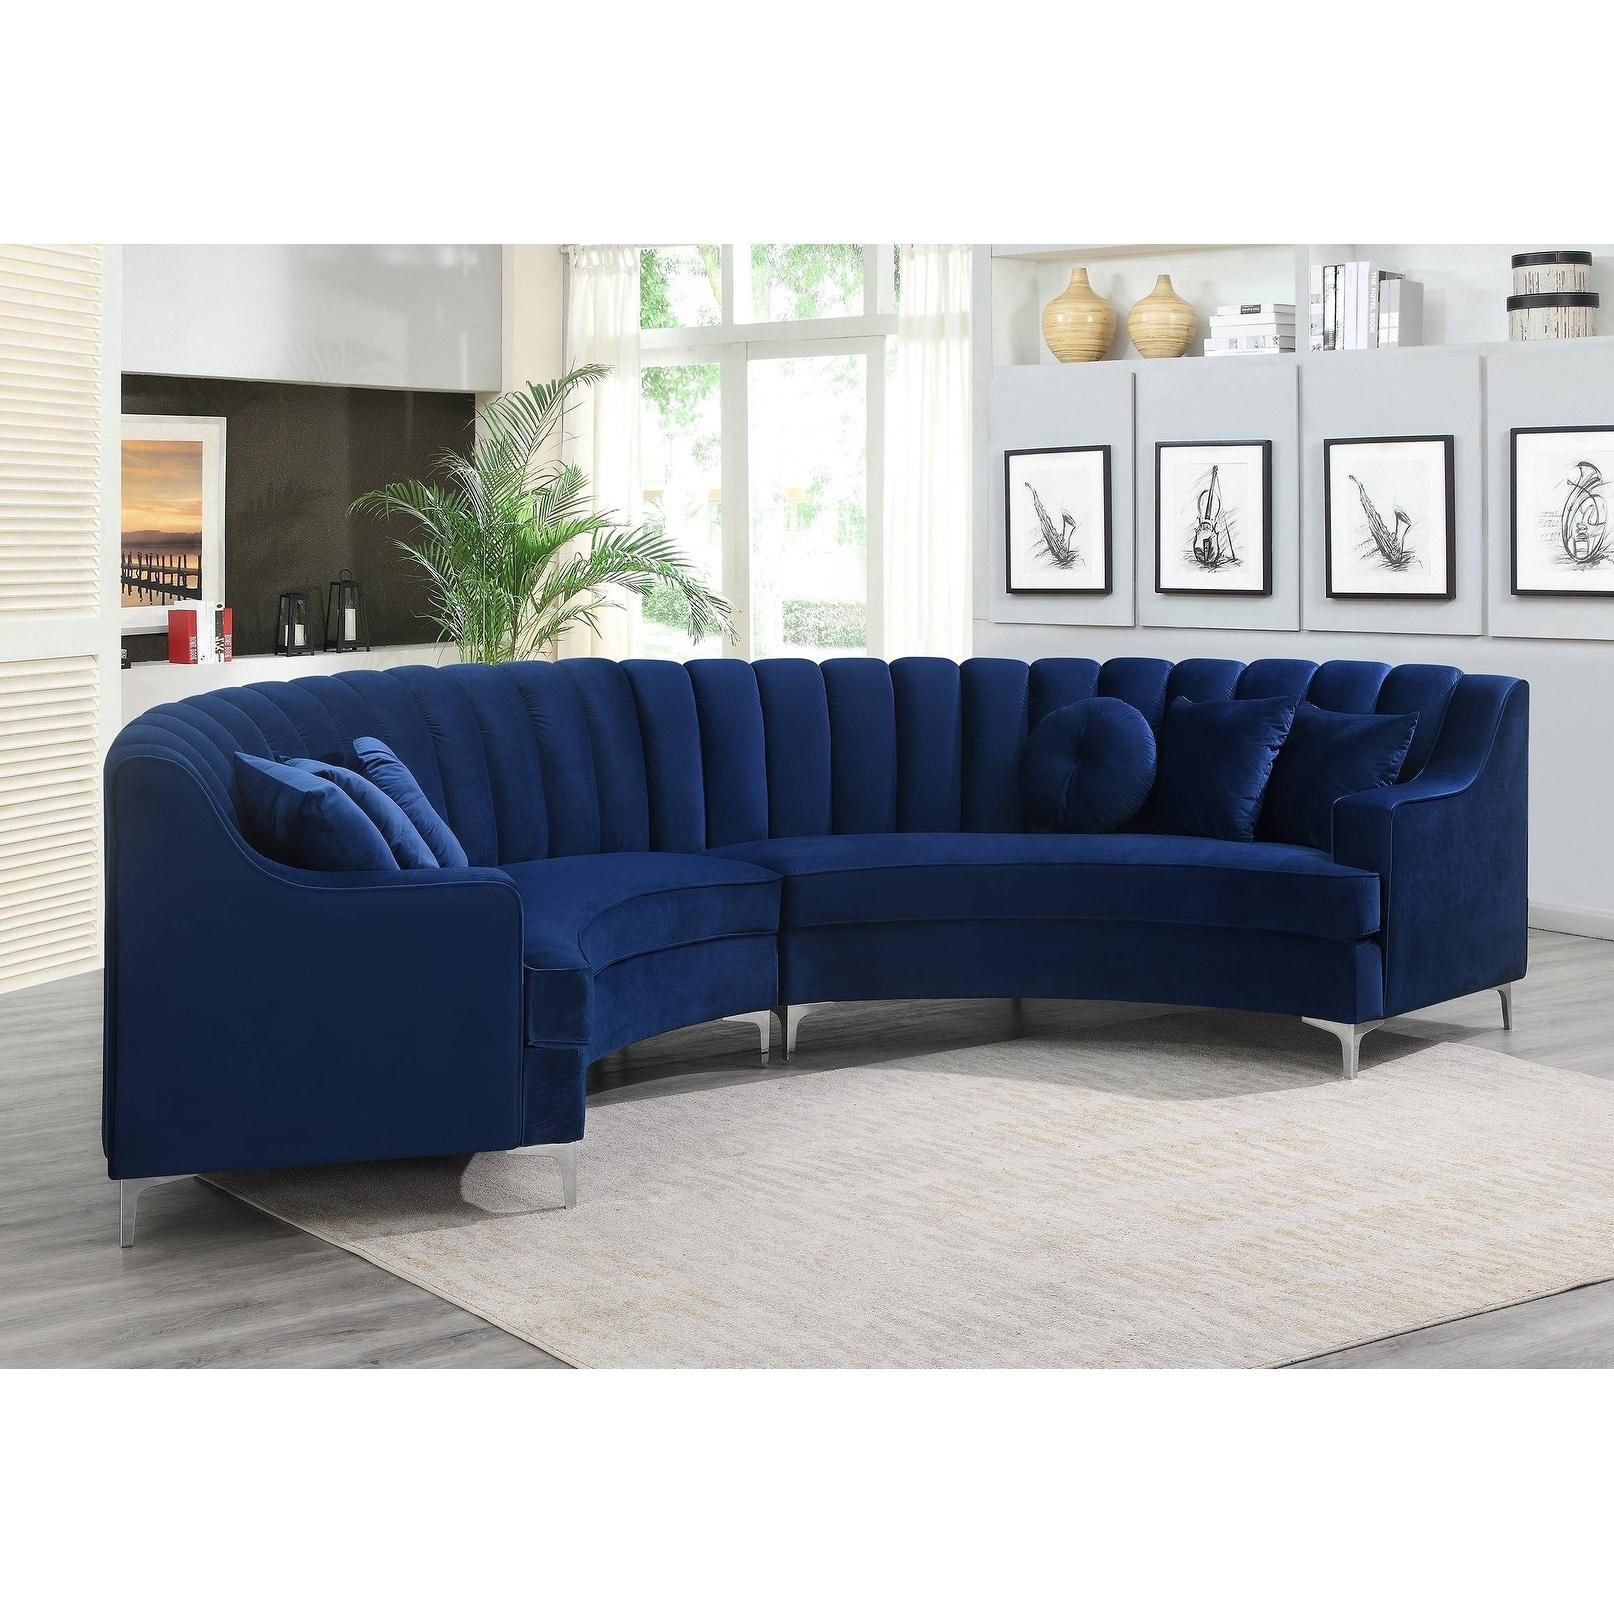 Modern Curved Velvet Sectional Sofa 141 8 X 28 X 35 1 141 8x28x35 1 Overstock 30884971